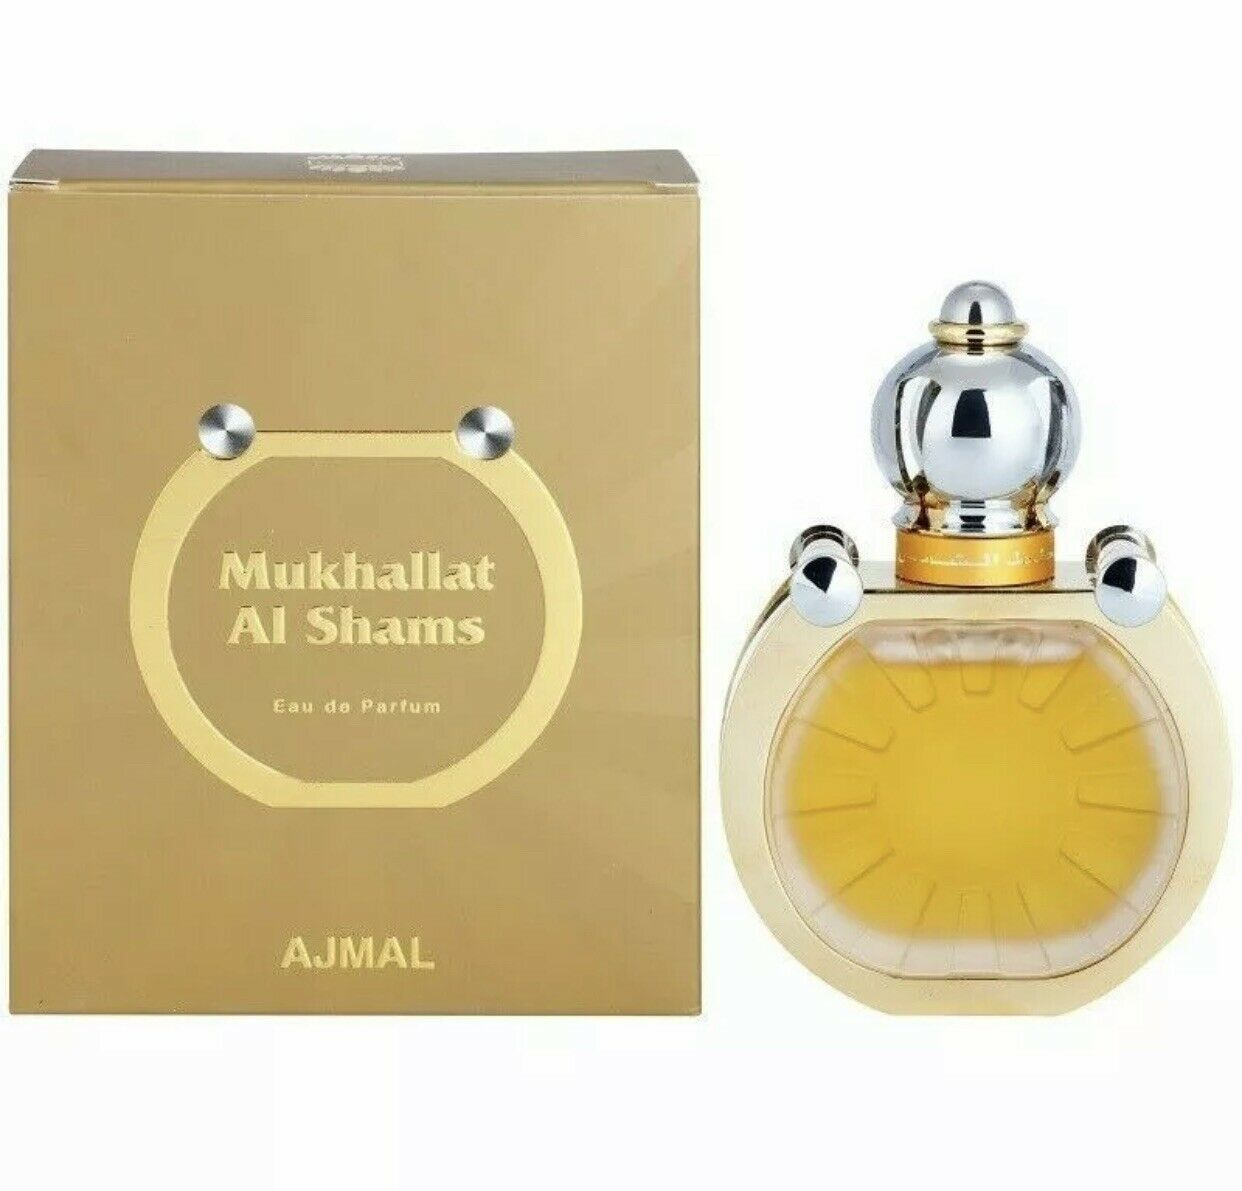 Mukhallat Al Shams by Ajmal Perfumes 50ml EDP Spray -  Express Shipping - $98.01